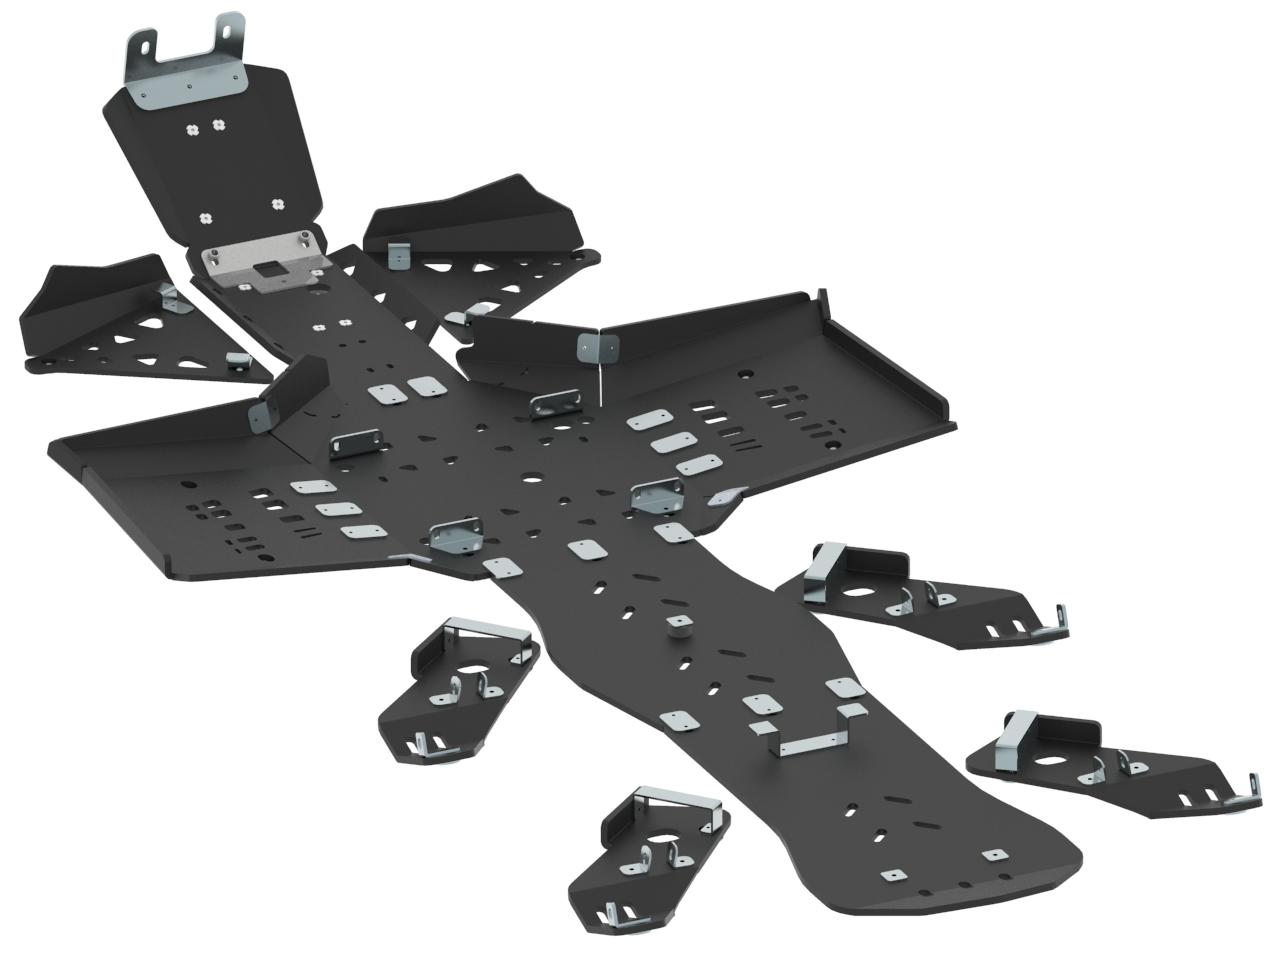 Skid plate full set (plastic) CanAm G2 Outlander 6x6 (2017+)  sc 1 st  Iron Baltic & Skid plate full set (plastic): CanAm G2 Outlander 6x6: (2017+) fo